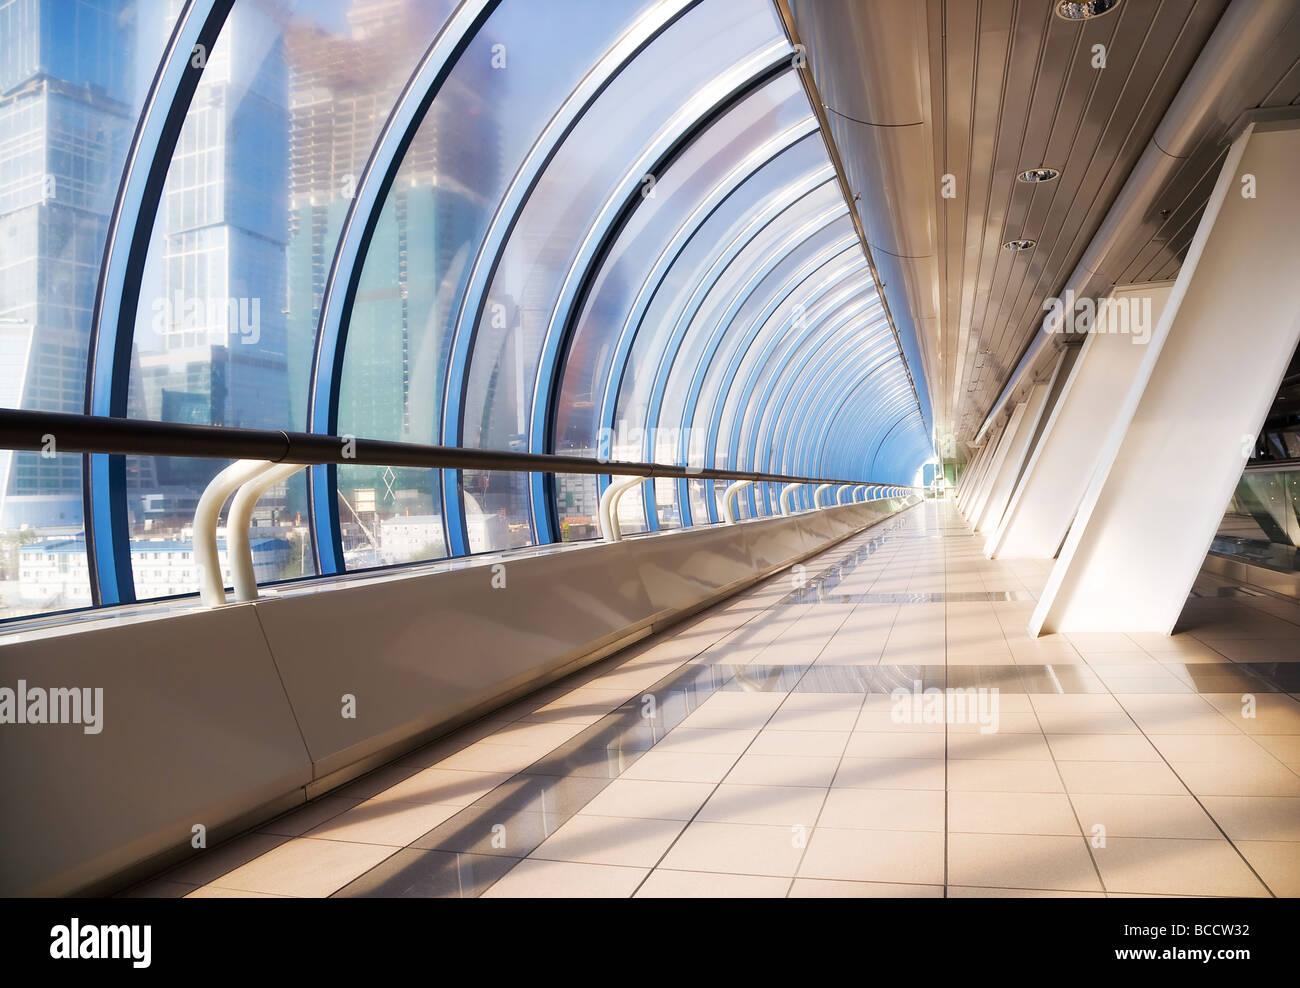 Pont moderne grand angle intérieur Photo Stock